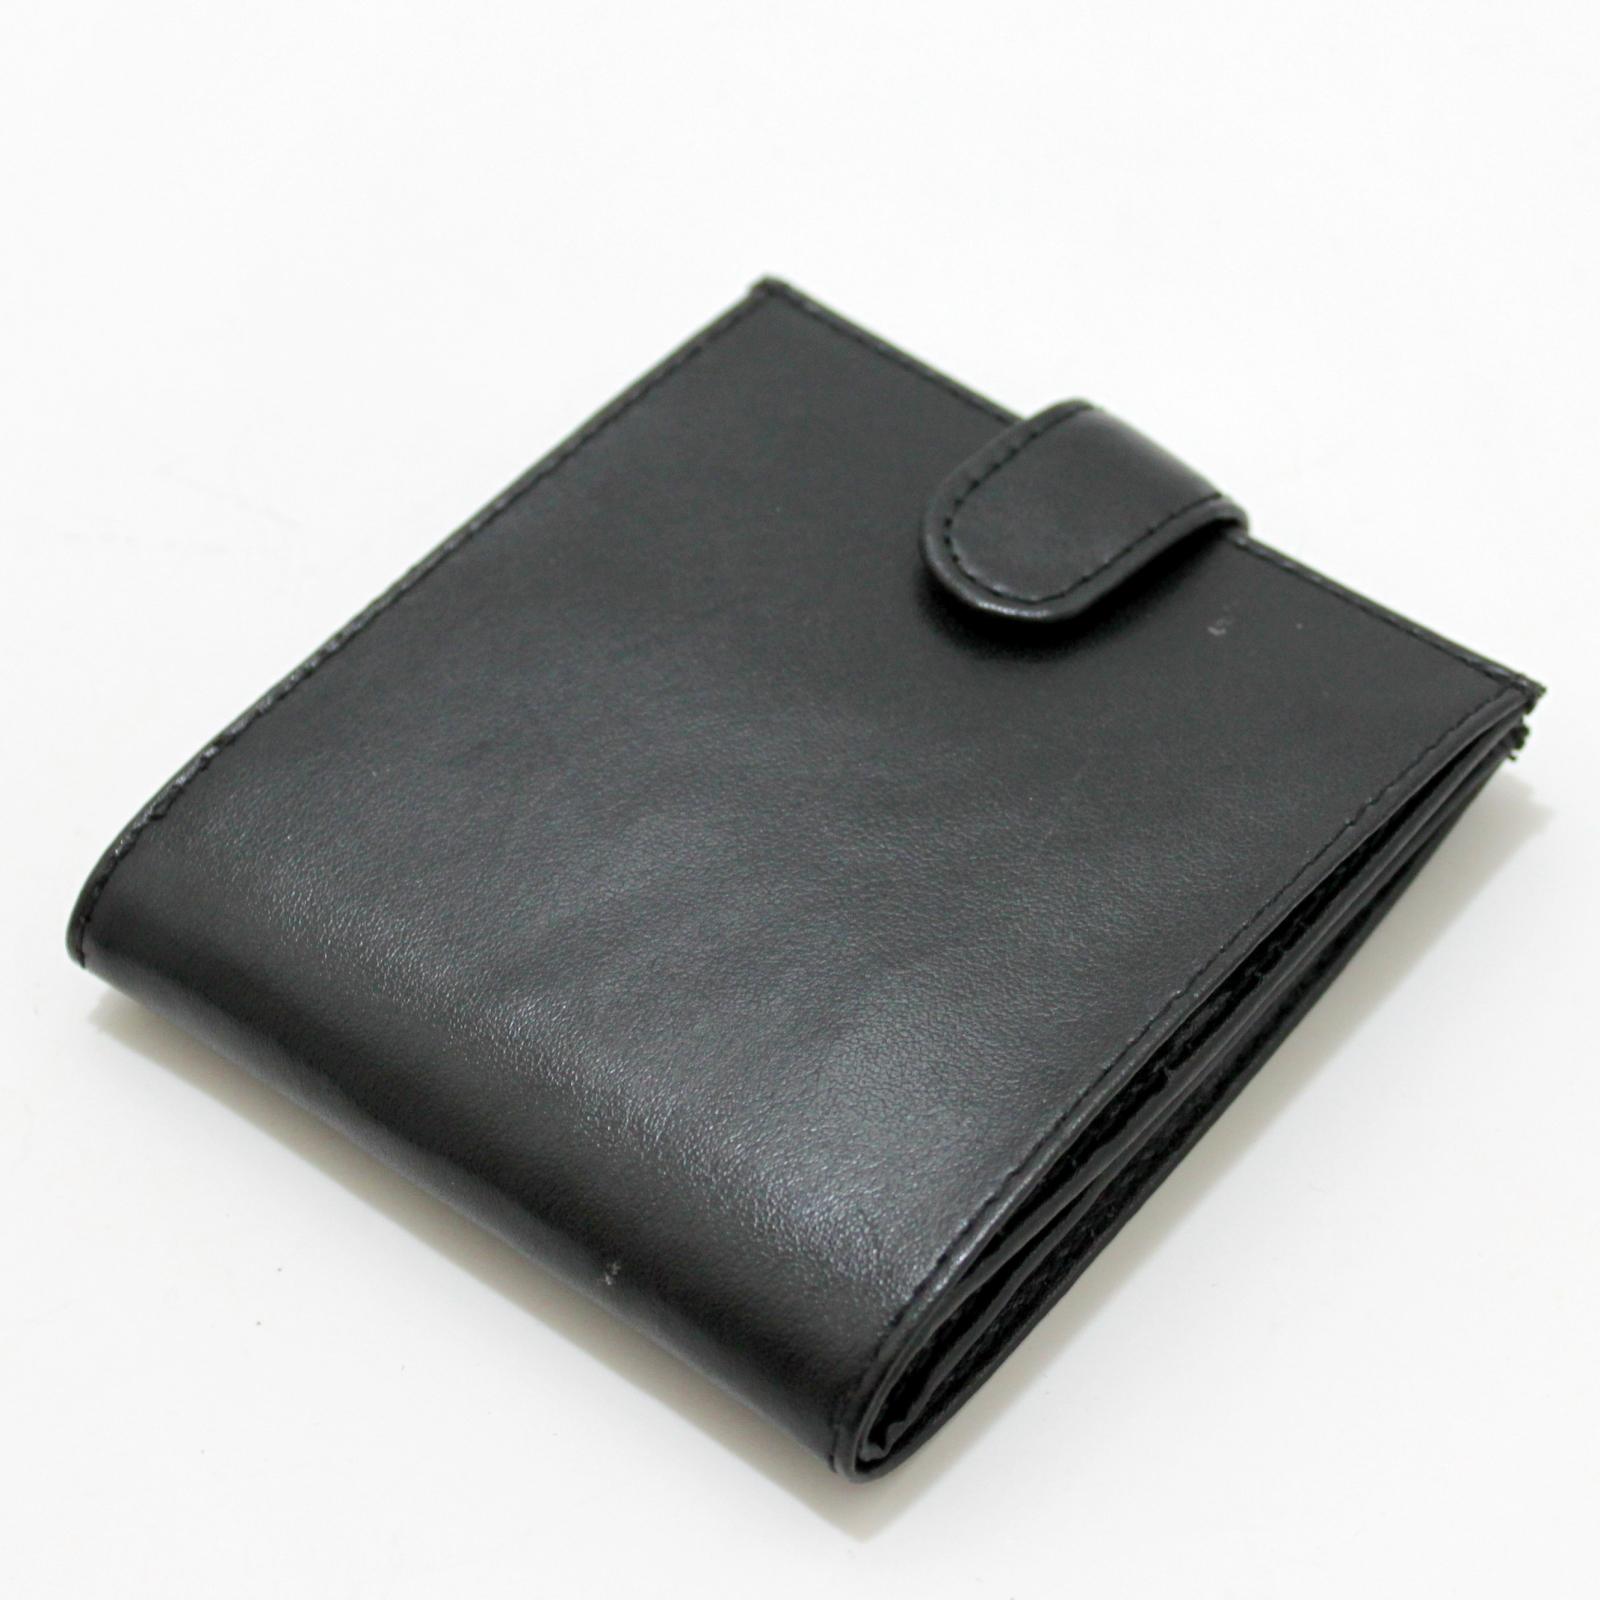 The Weber Wallet by Michael Weber